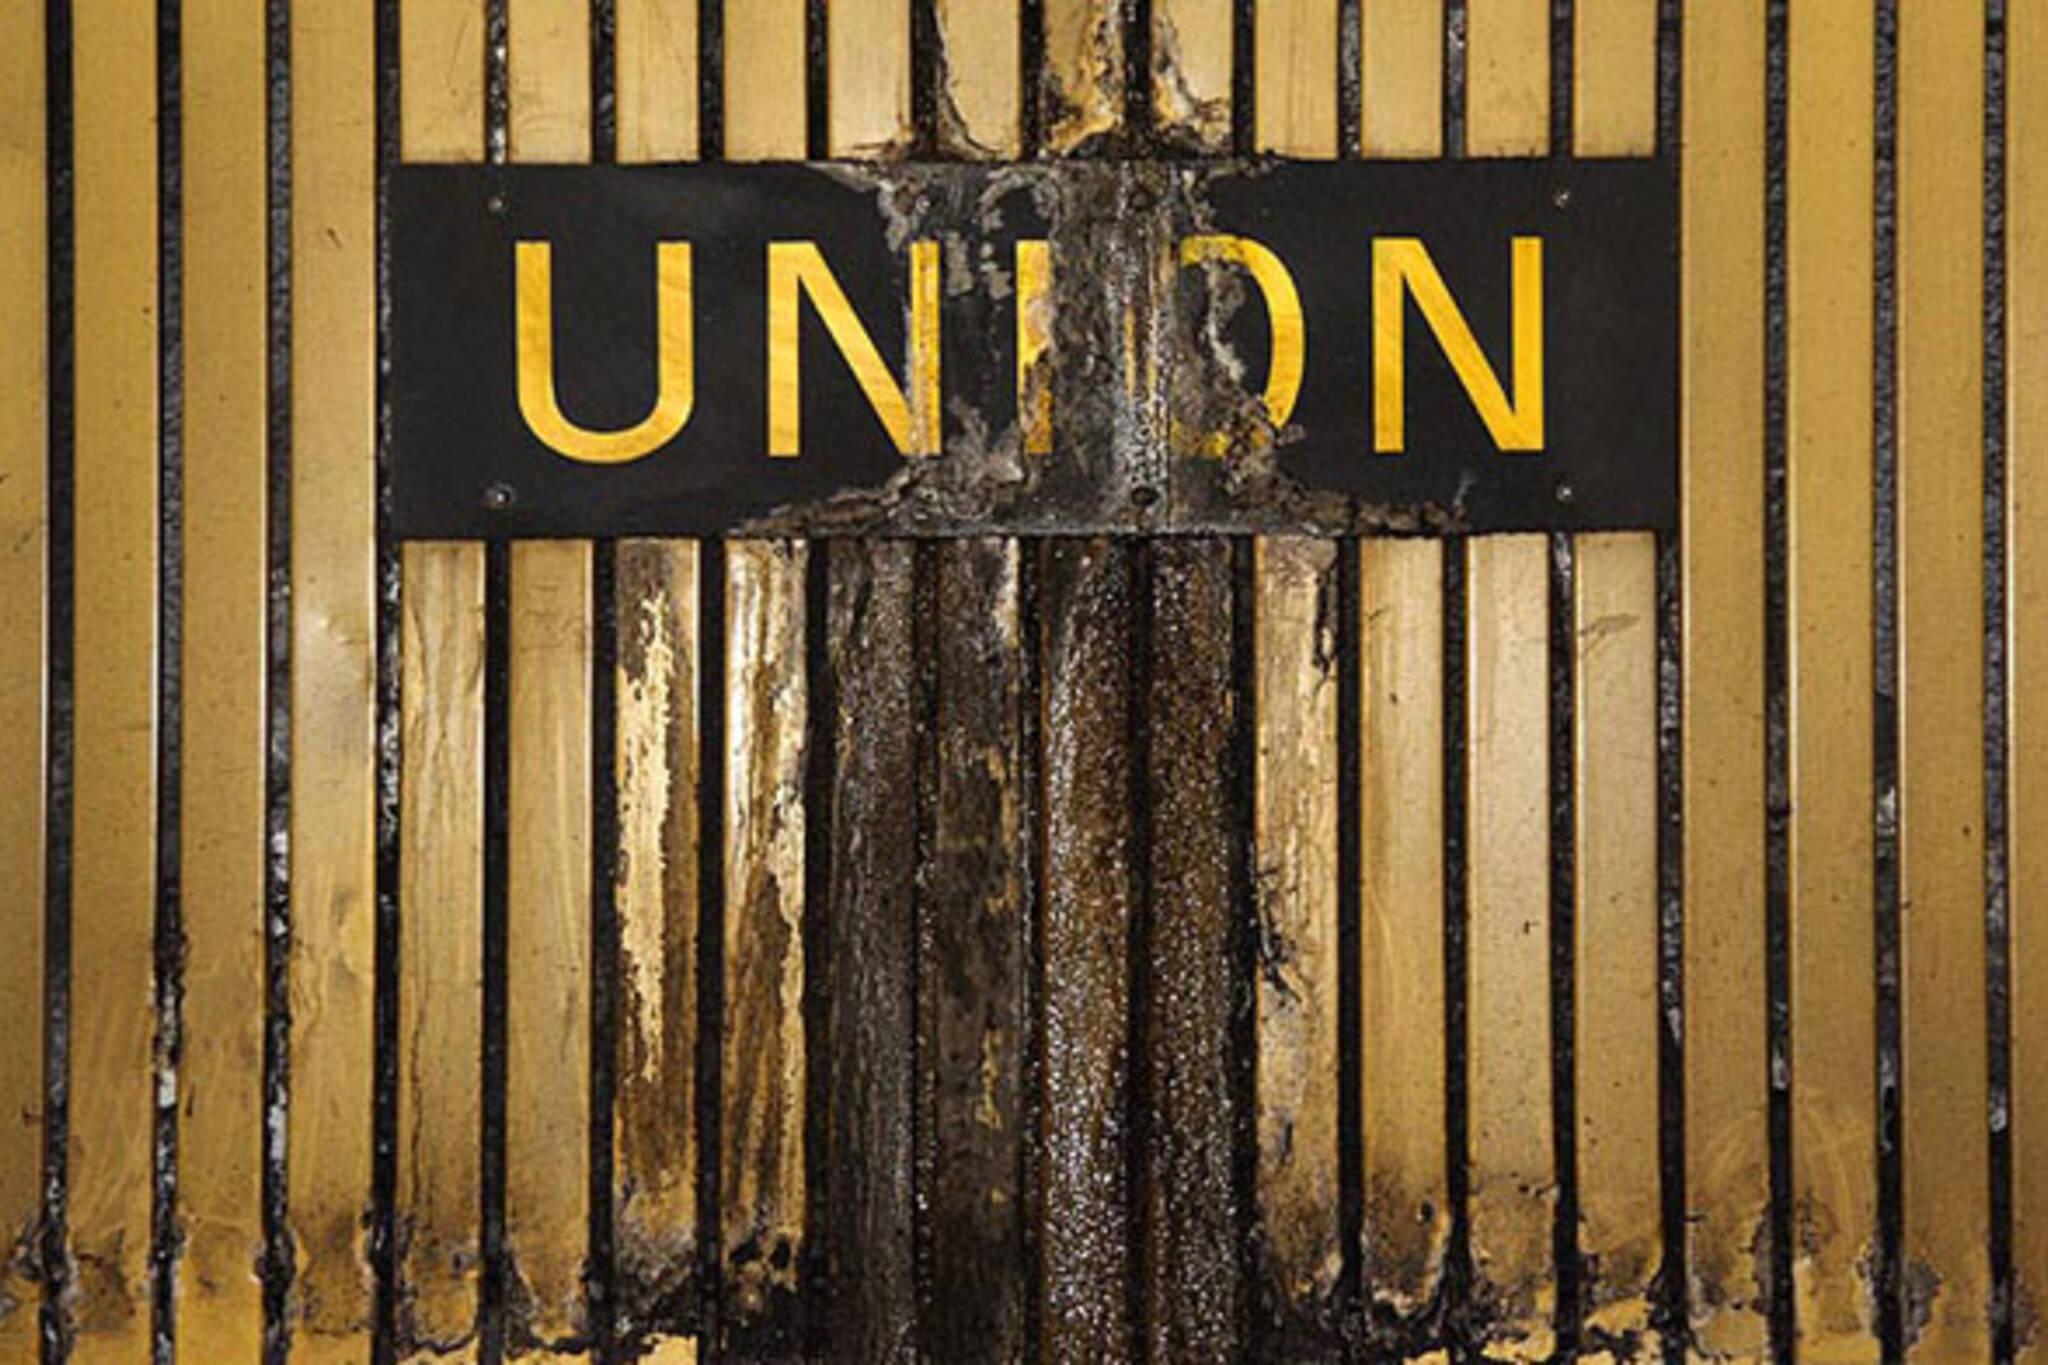 TTC Union